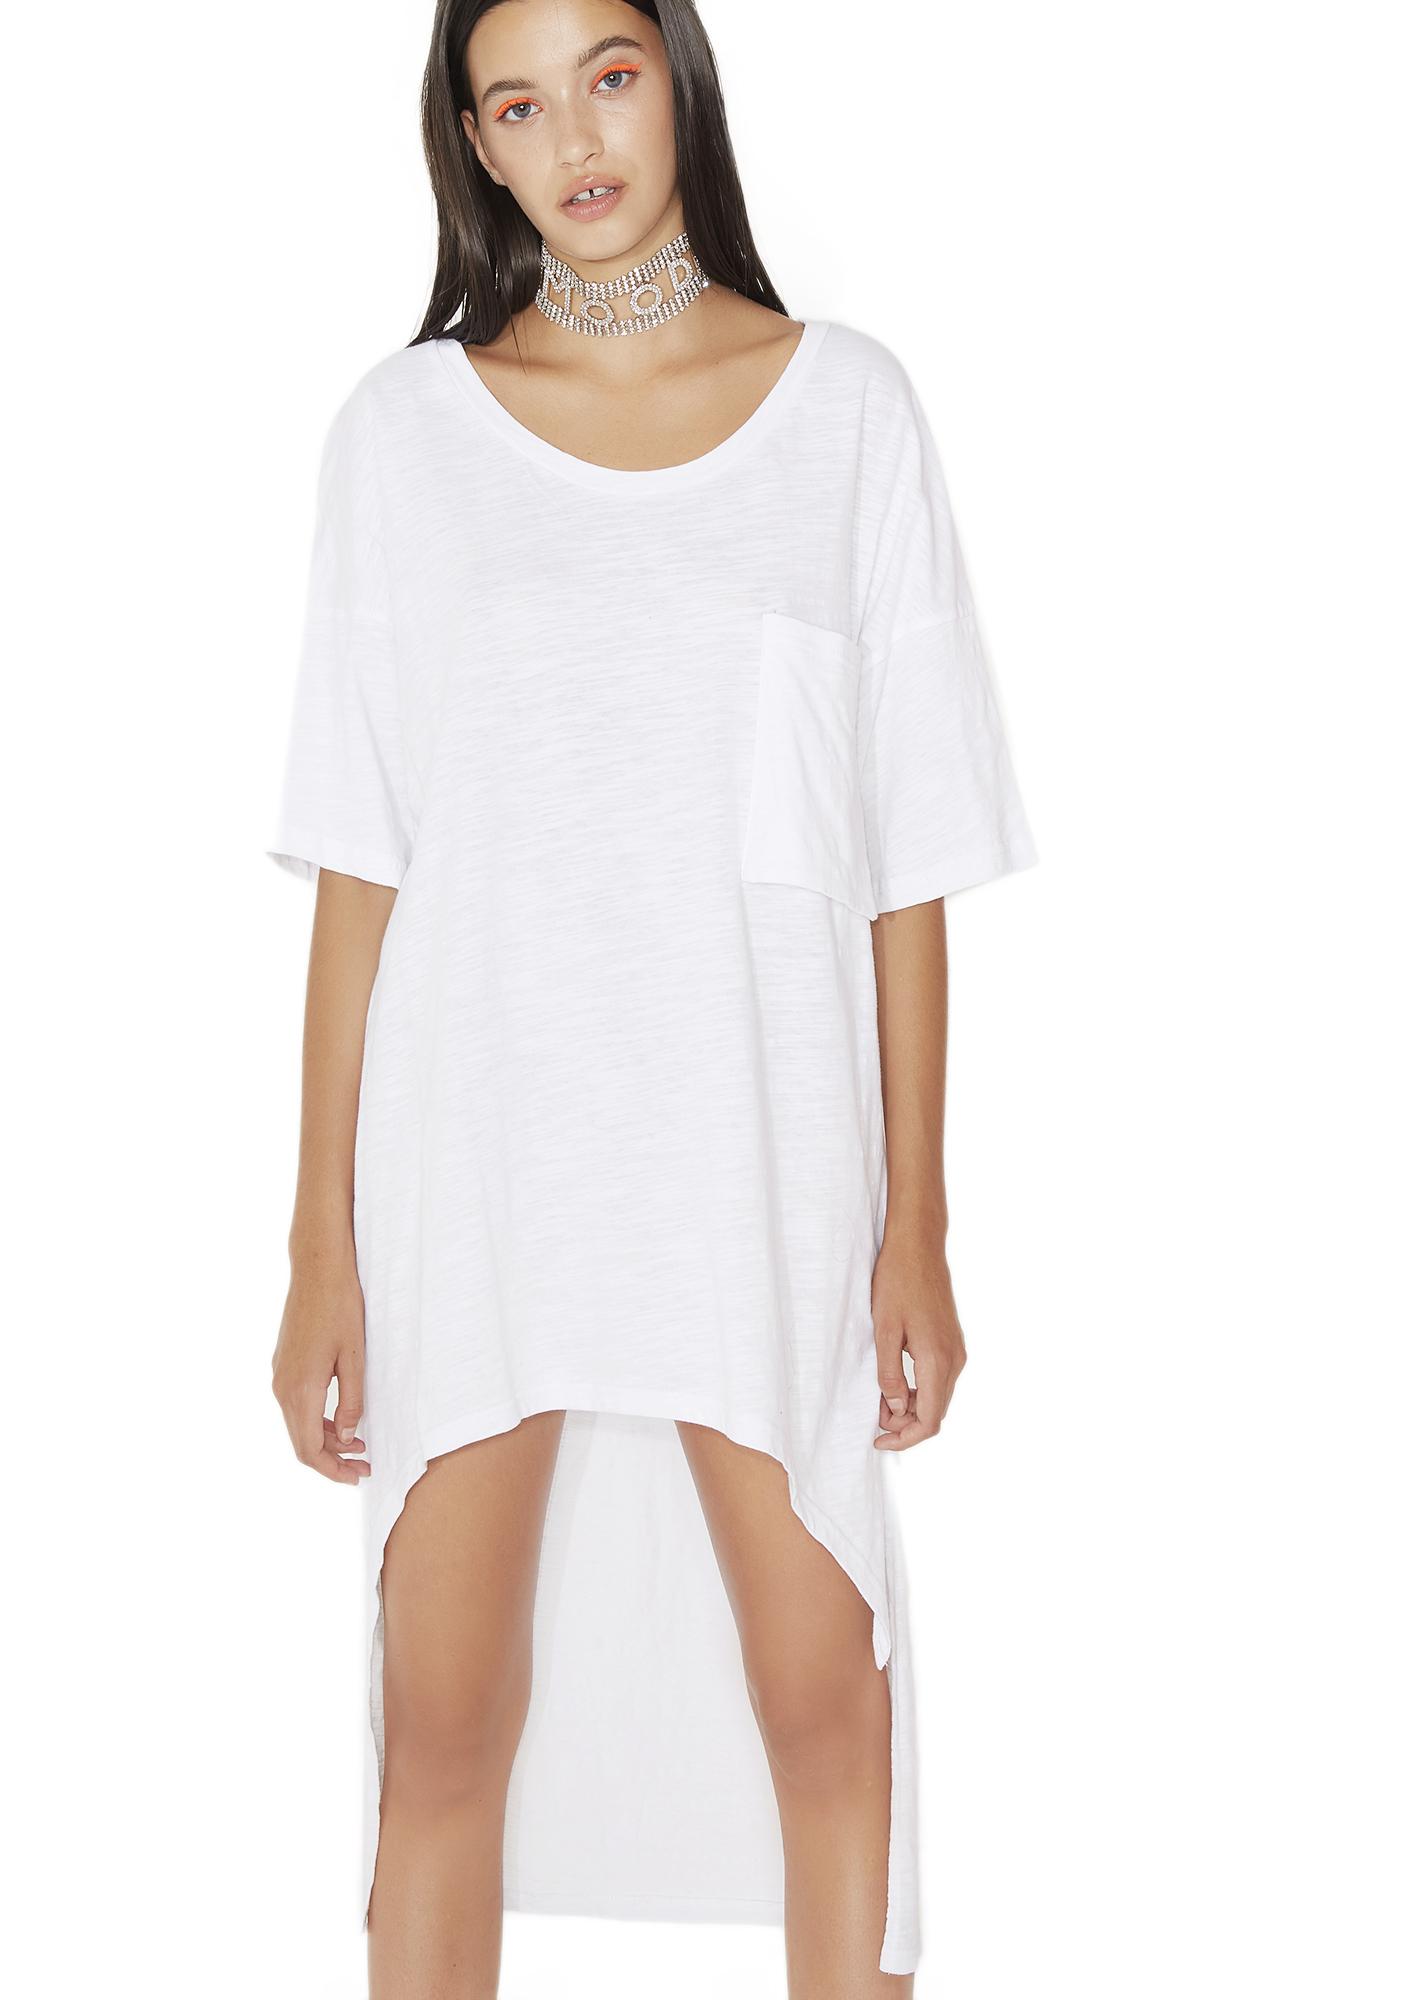 Split Ways T-Shirt Dress